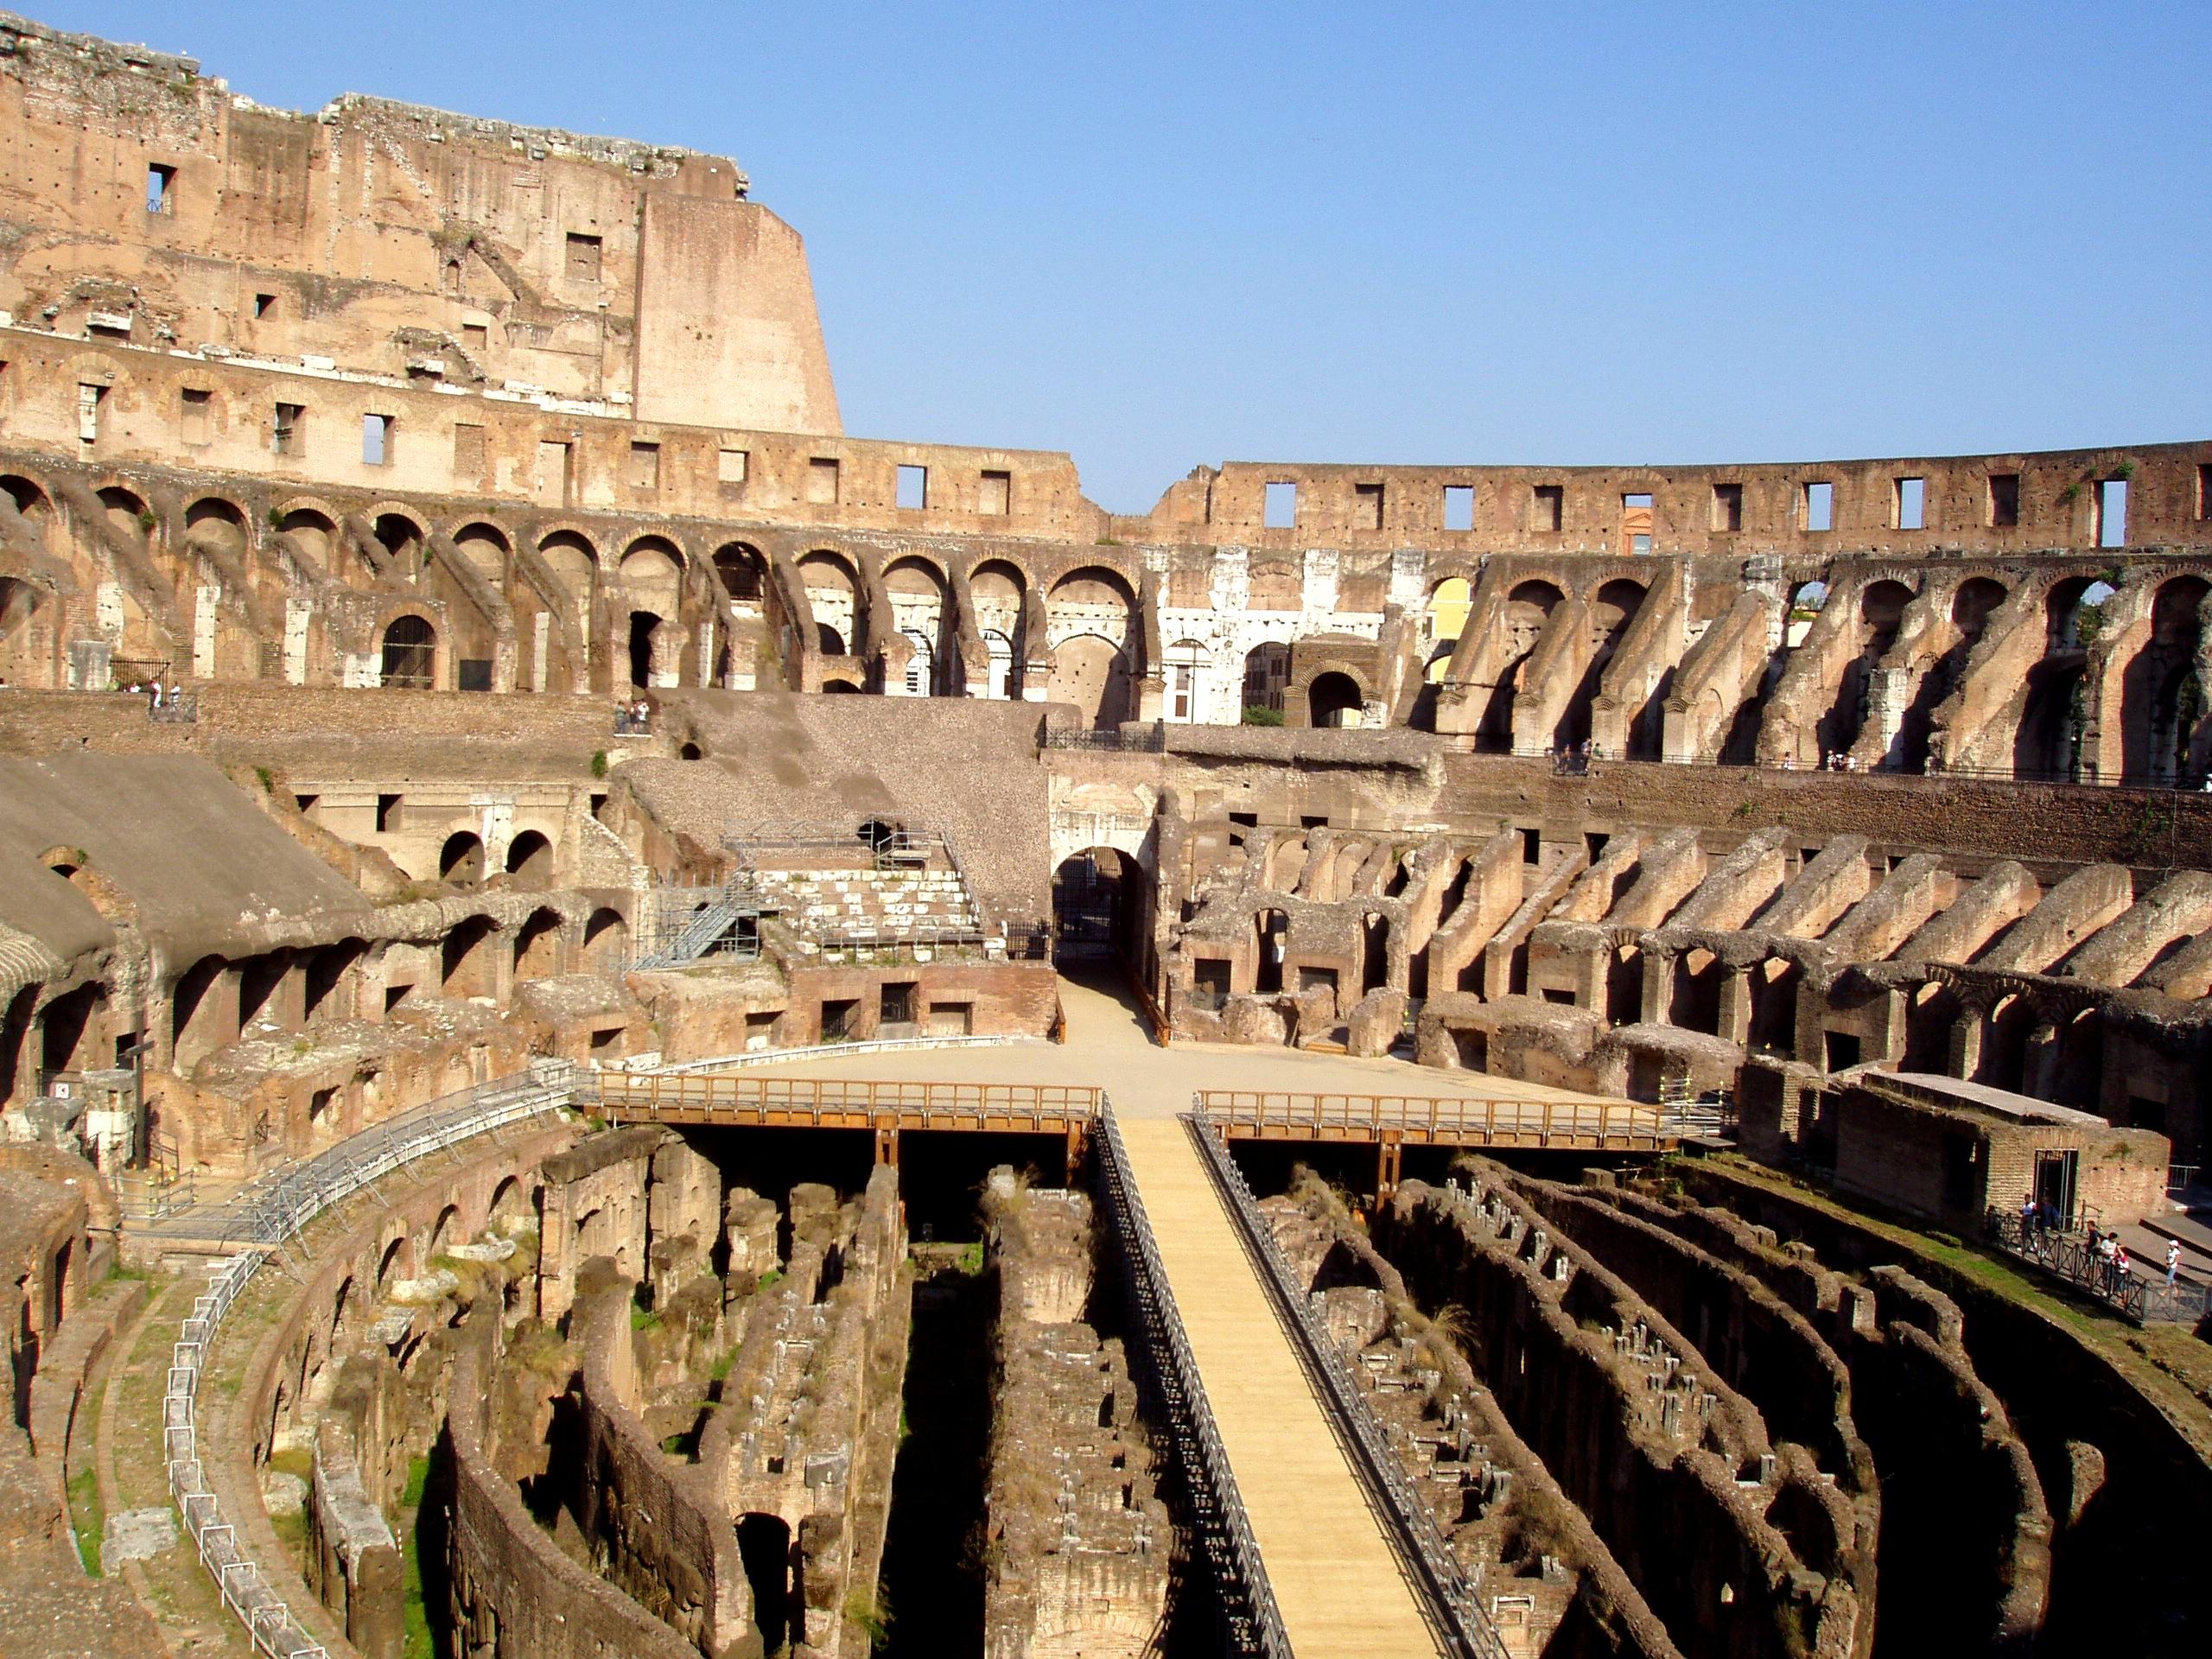 The Coliseum Italy